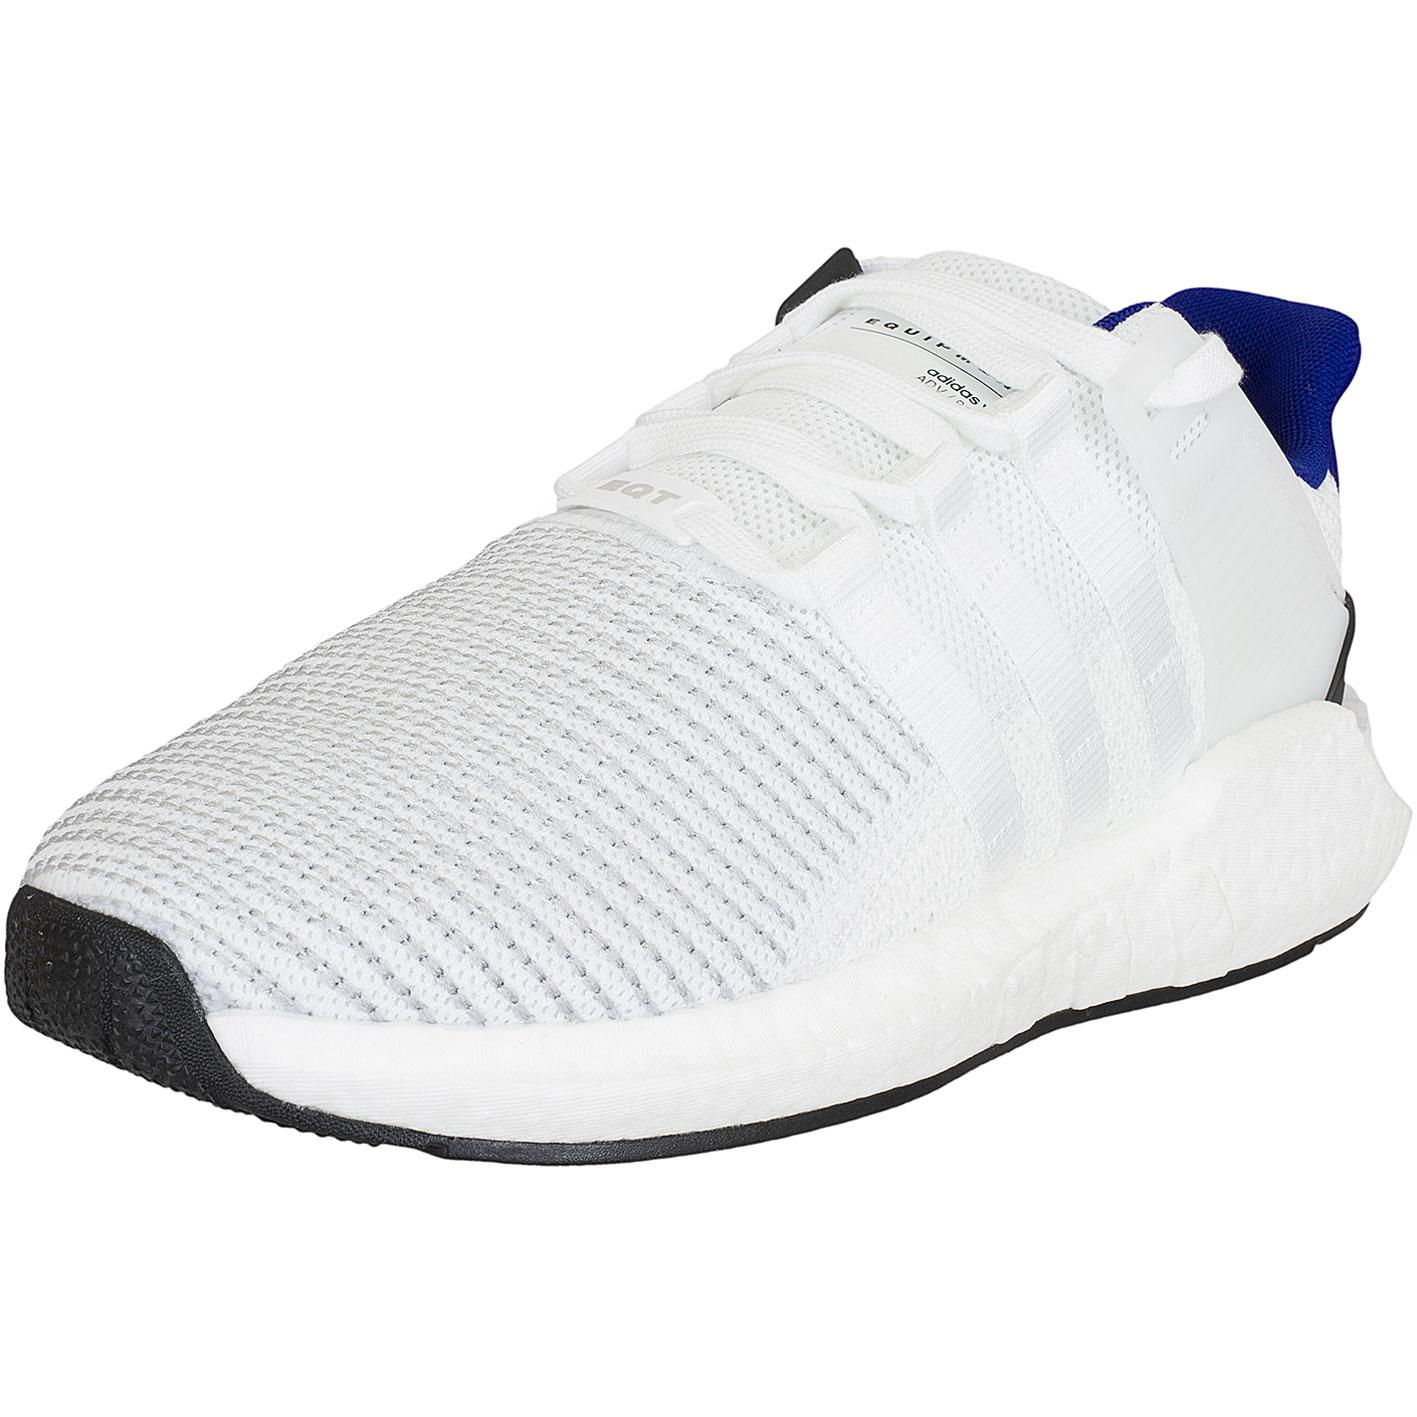 adidas originals sneaker equipment support 93 17 wei. Black Bedroom Furniture Sets. Home Design Ideas